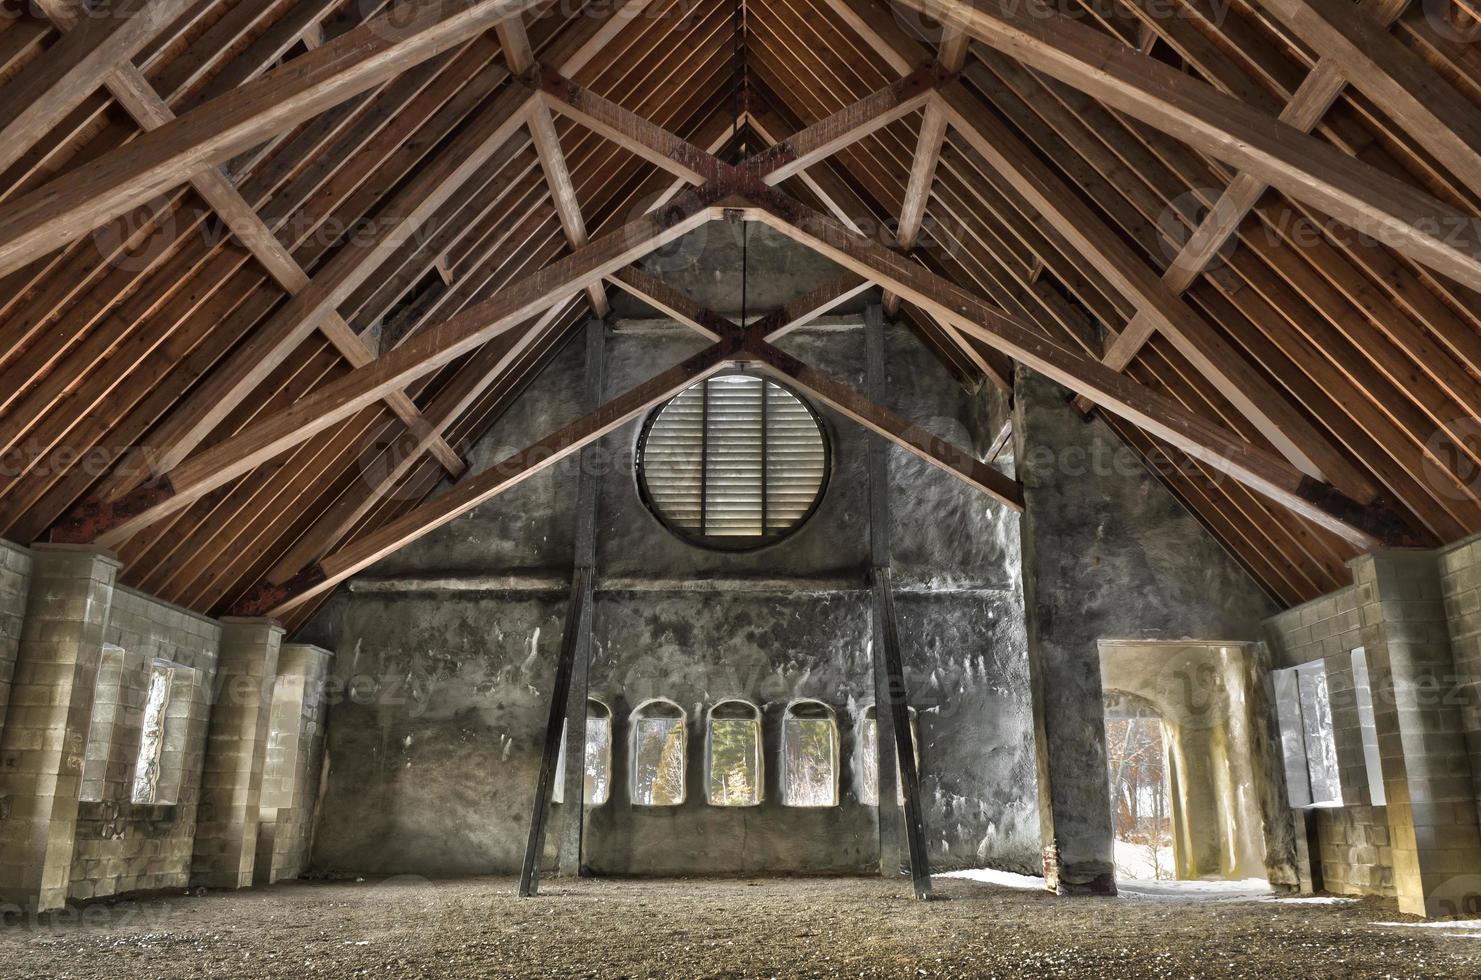 antiguo interior de la iglesia de piedra foto